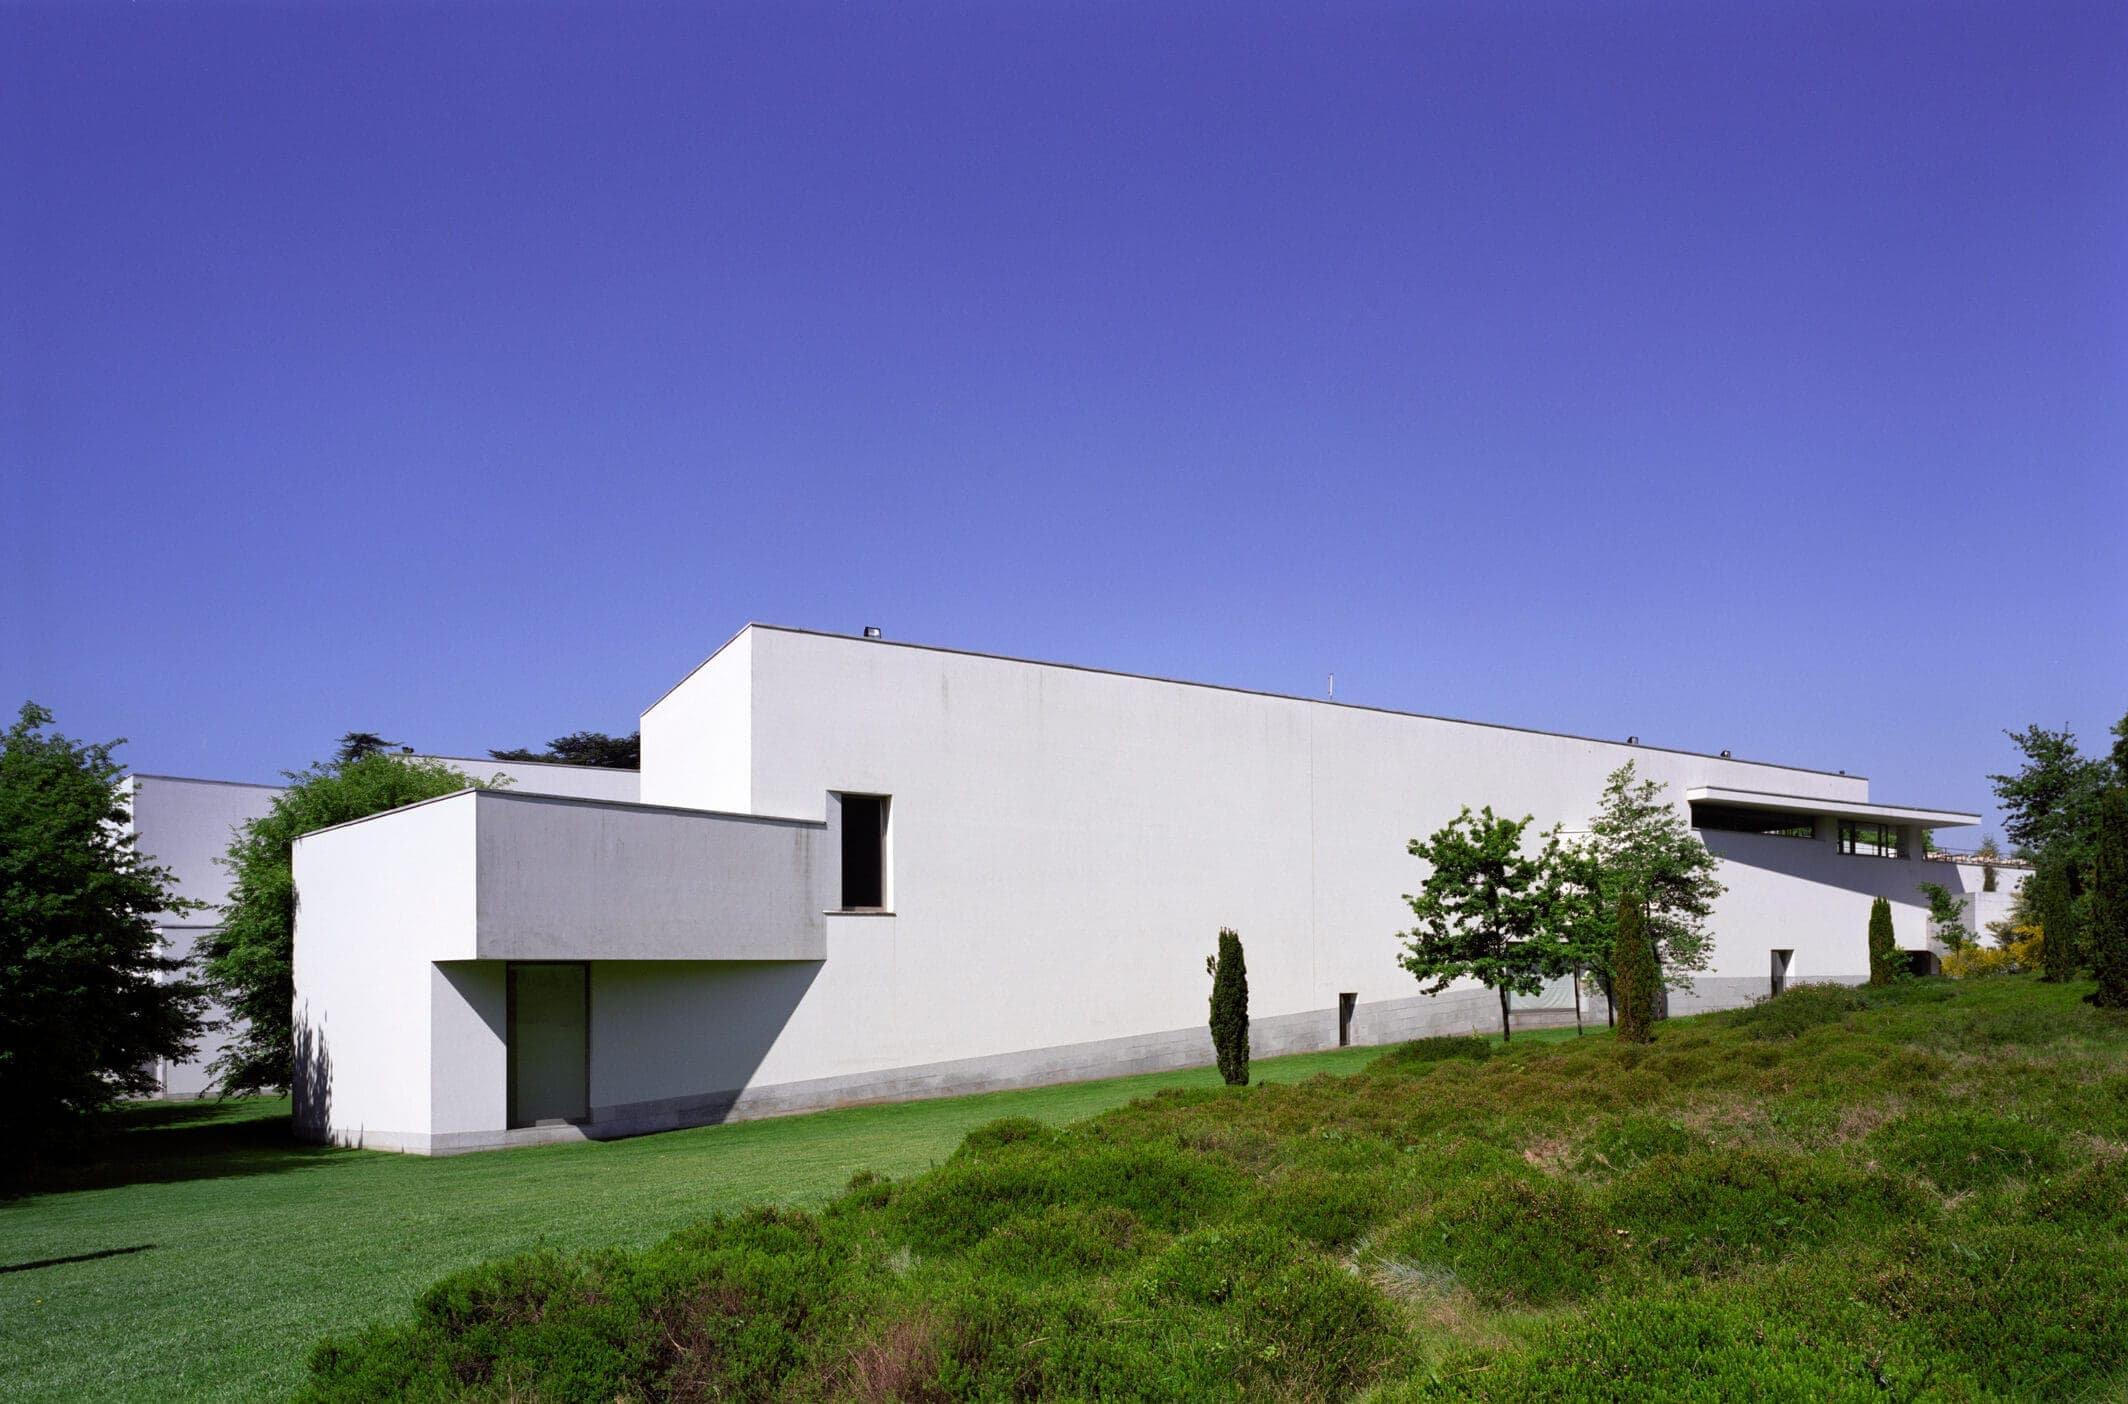 Museu%20de%20Serralves%20-%20Foto%20Marco%20Introini%20%C2%A9Funda%C3%A7%C3%A3o%20Serralves%20